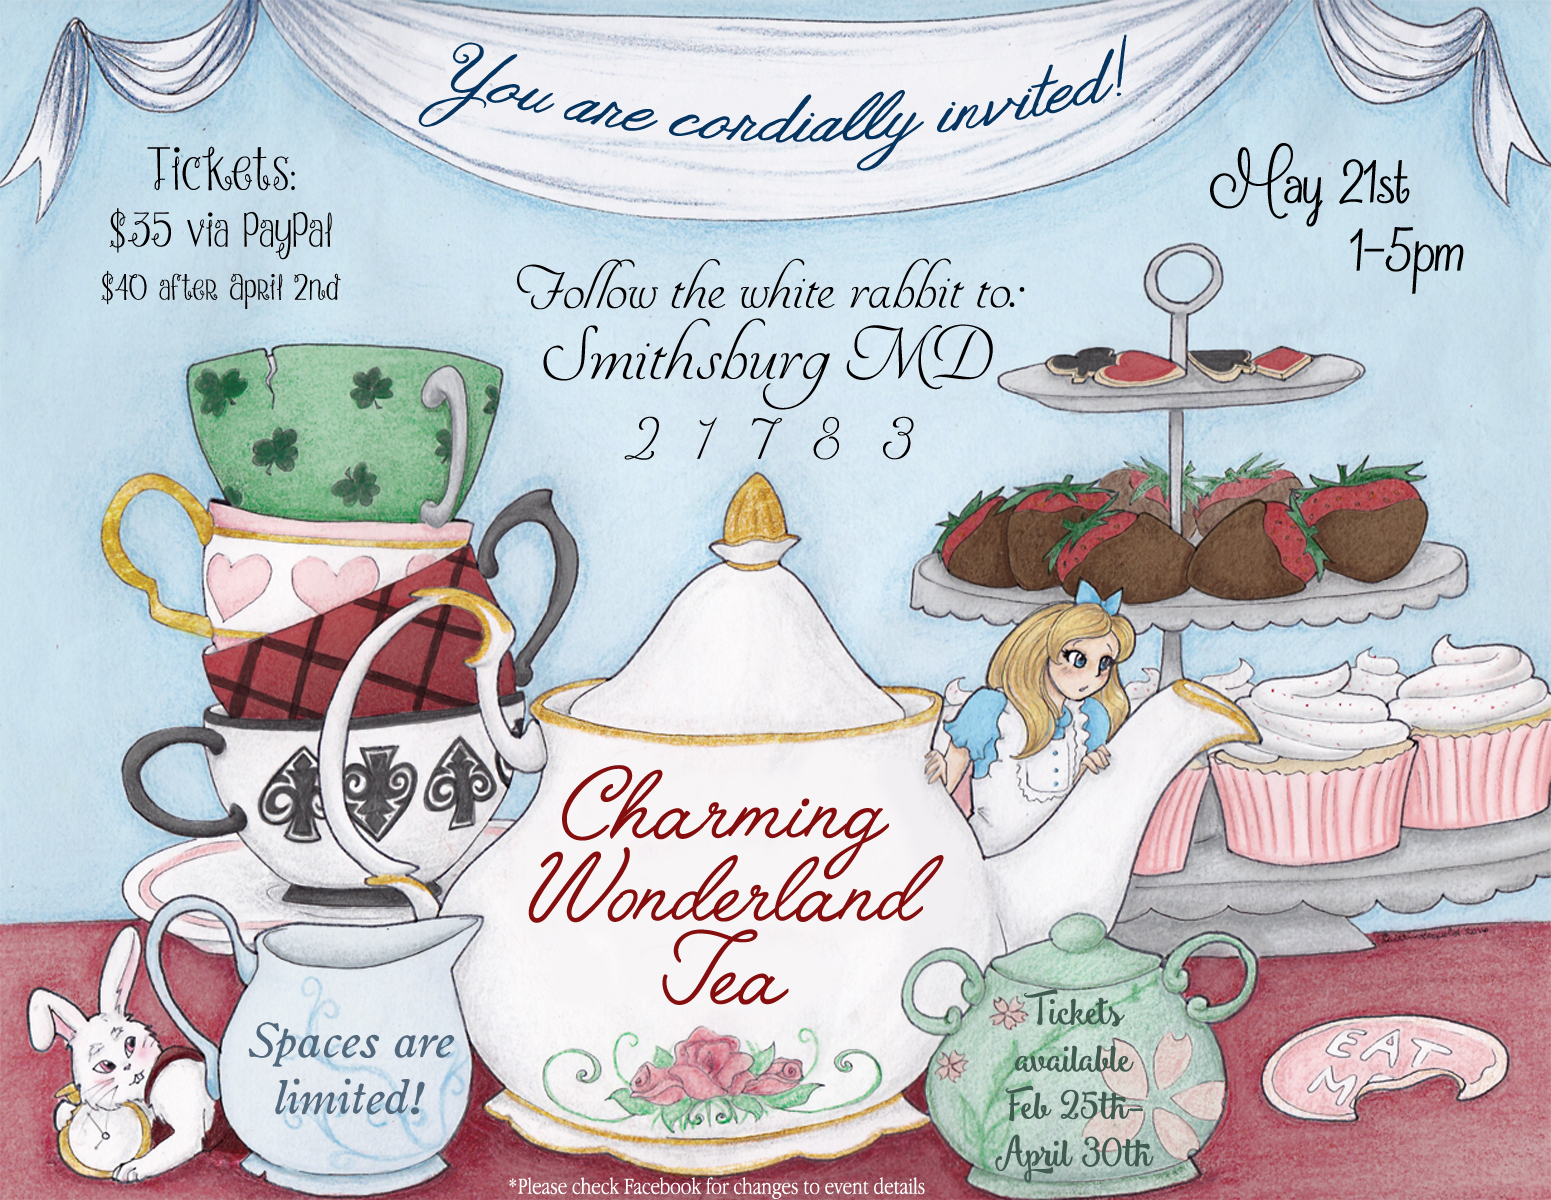 Charming Wonderland Tea Flyer